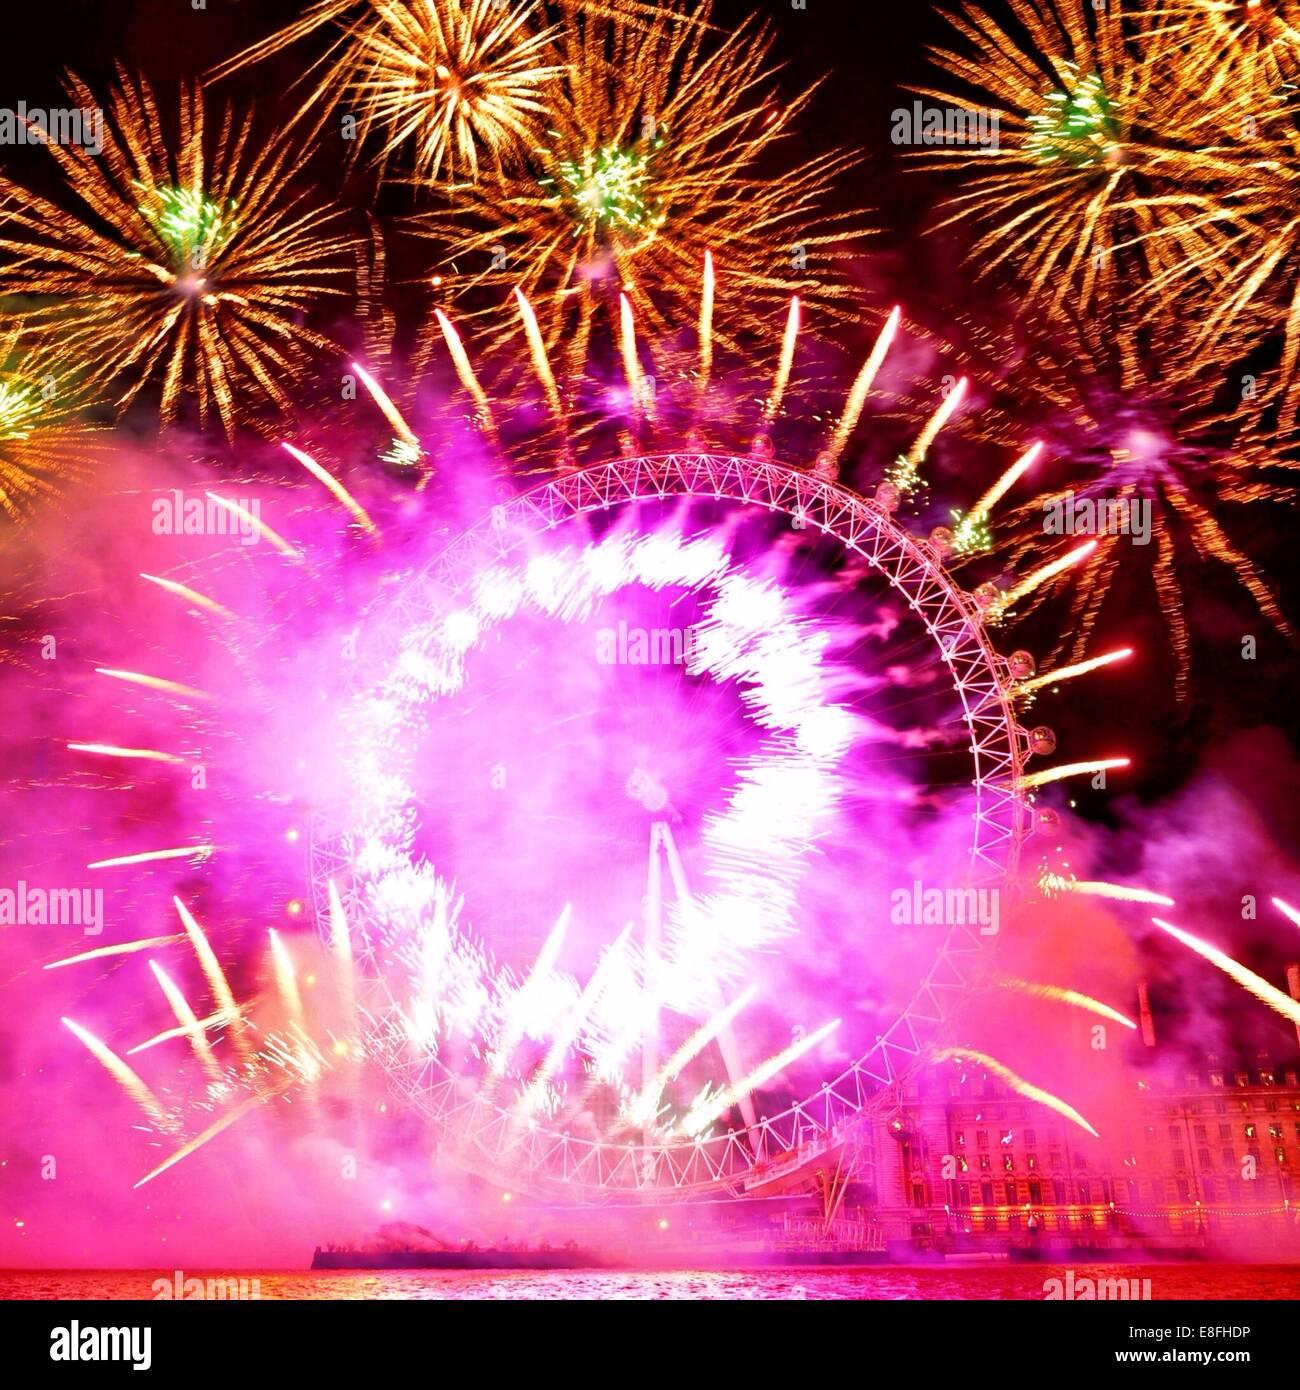 Reino Unido, Londres, London Eye Fireworks Imagen De Stock